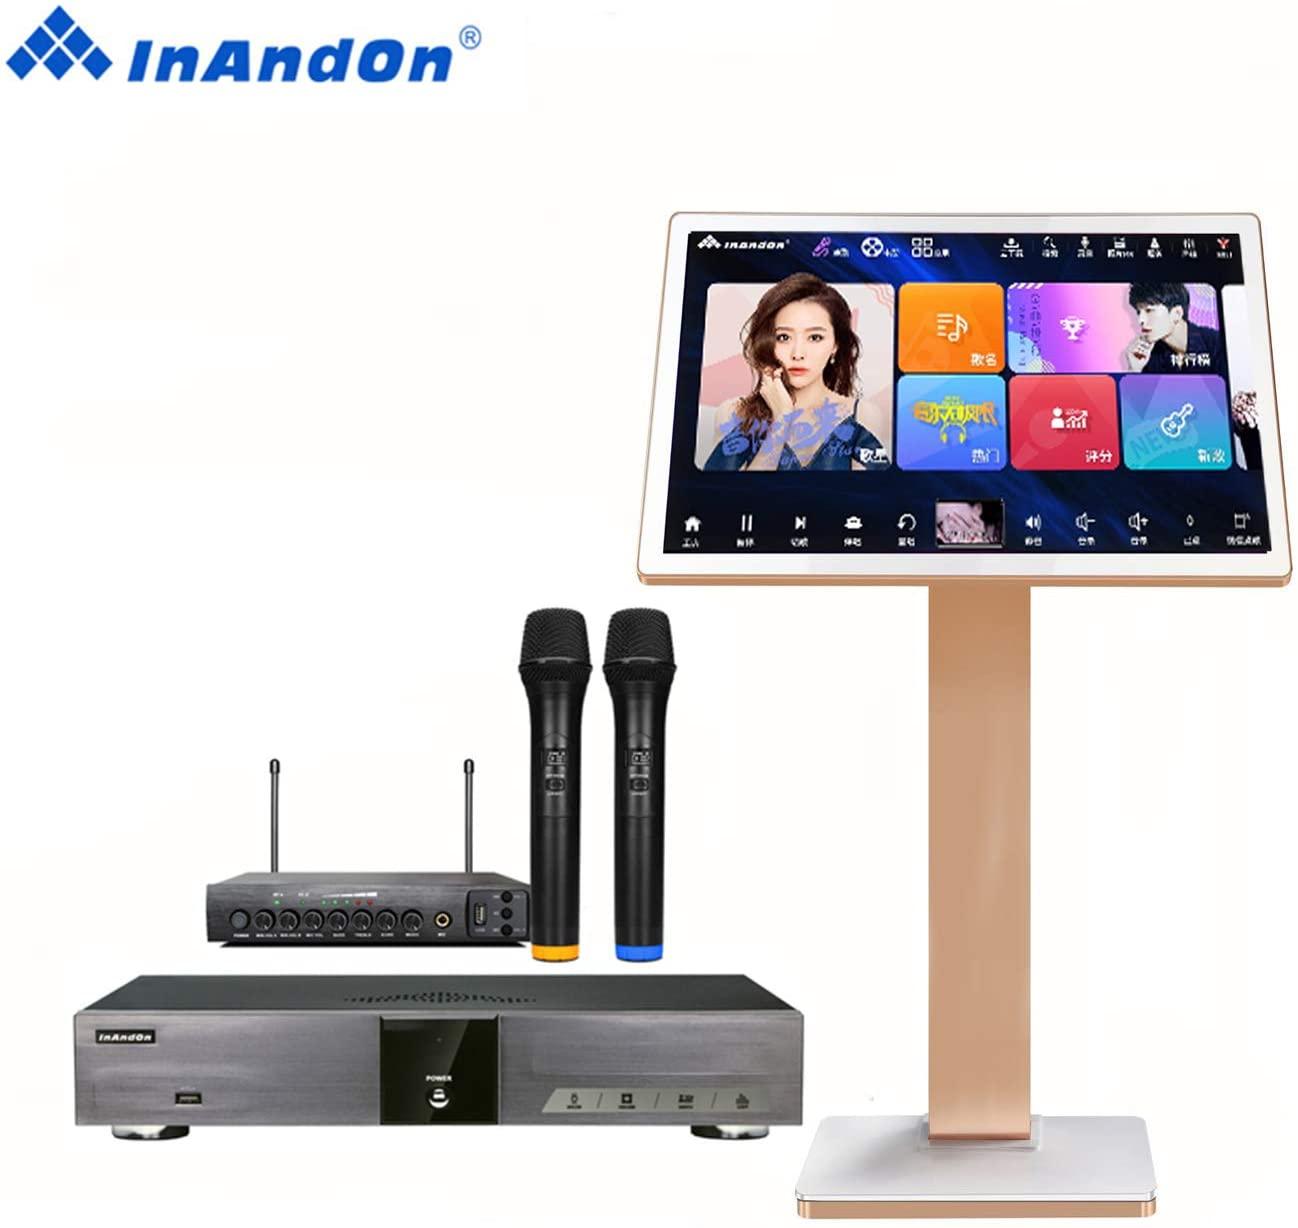 2020 new karaoke system InAndon KV - V5Pro professional karaoke jukebox, wireless microphone, karaoke players free download function of cloud, online movie double system(6TB +21.5